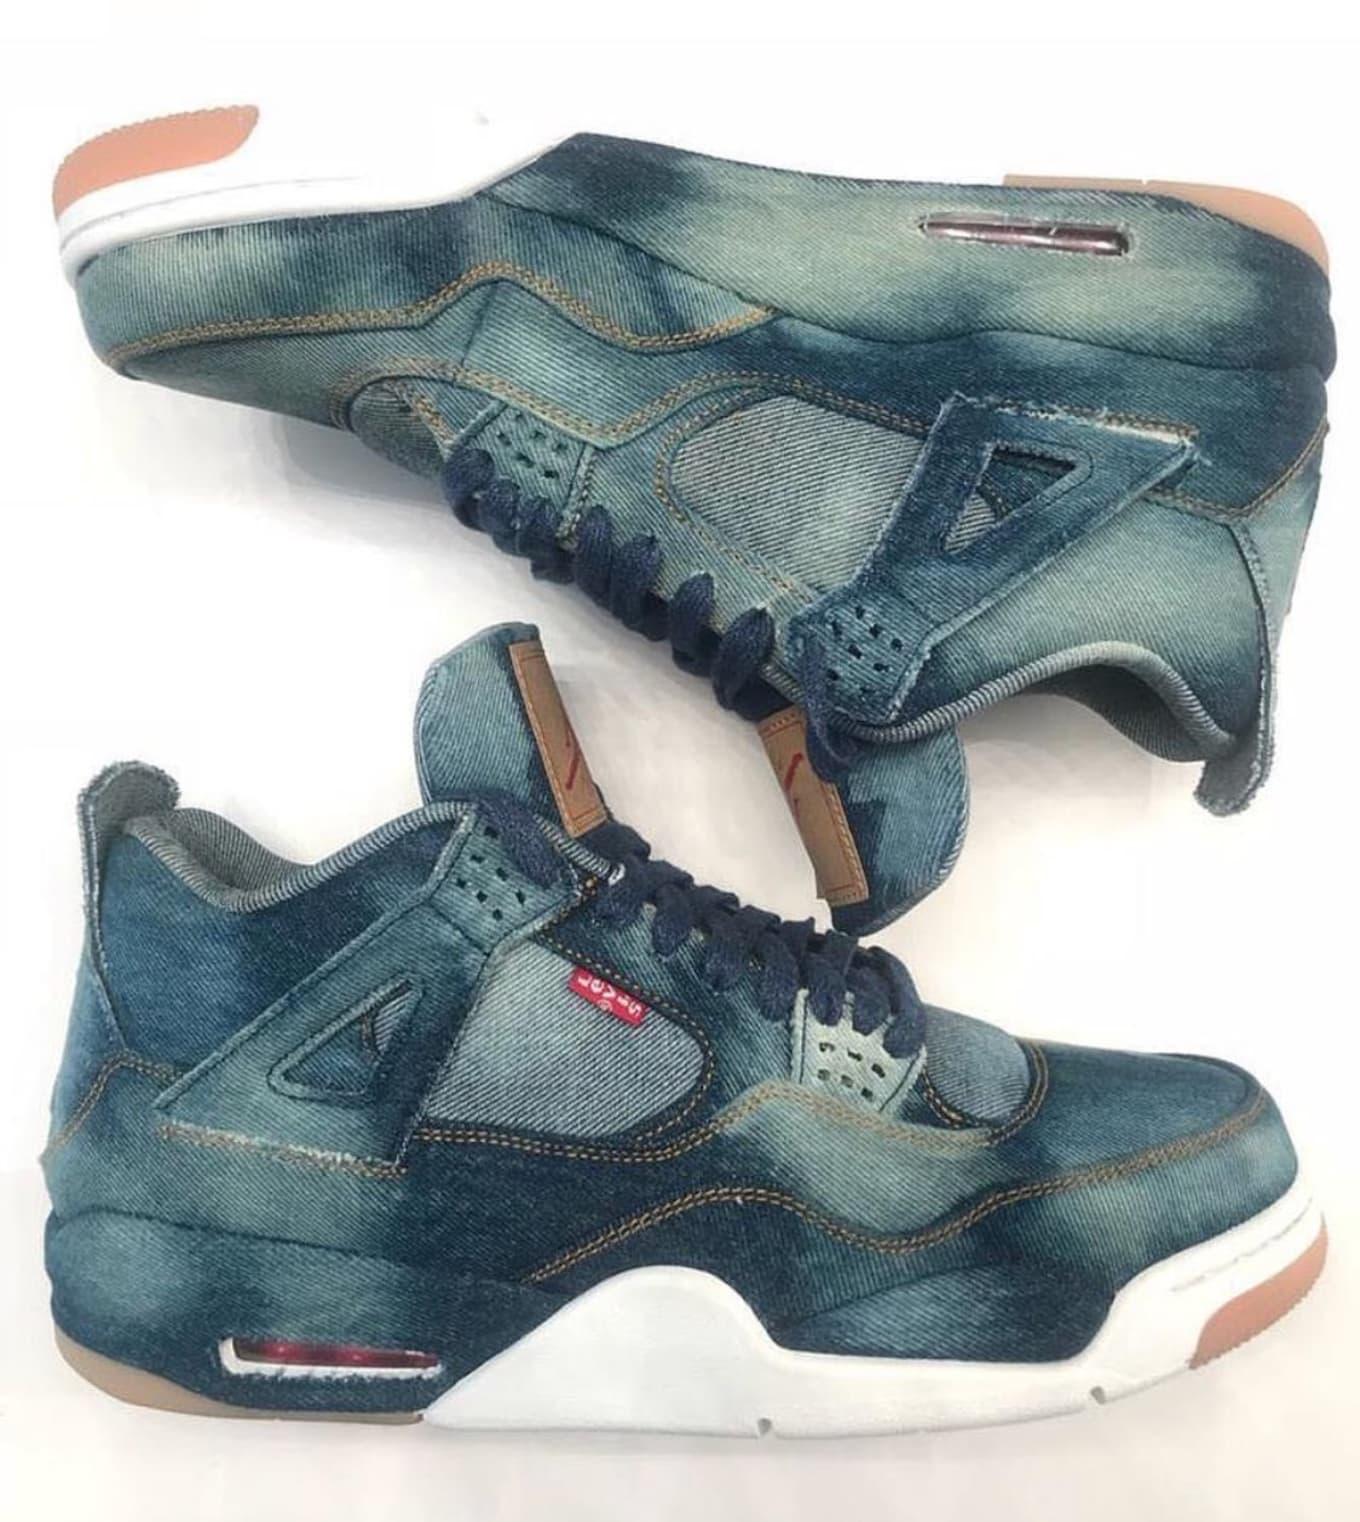 meet 7ed36 d2ede Custom Levi's x Air Jordan 4   Sole Collector